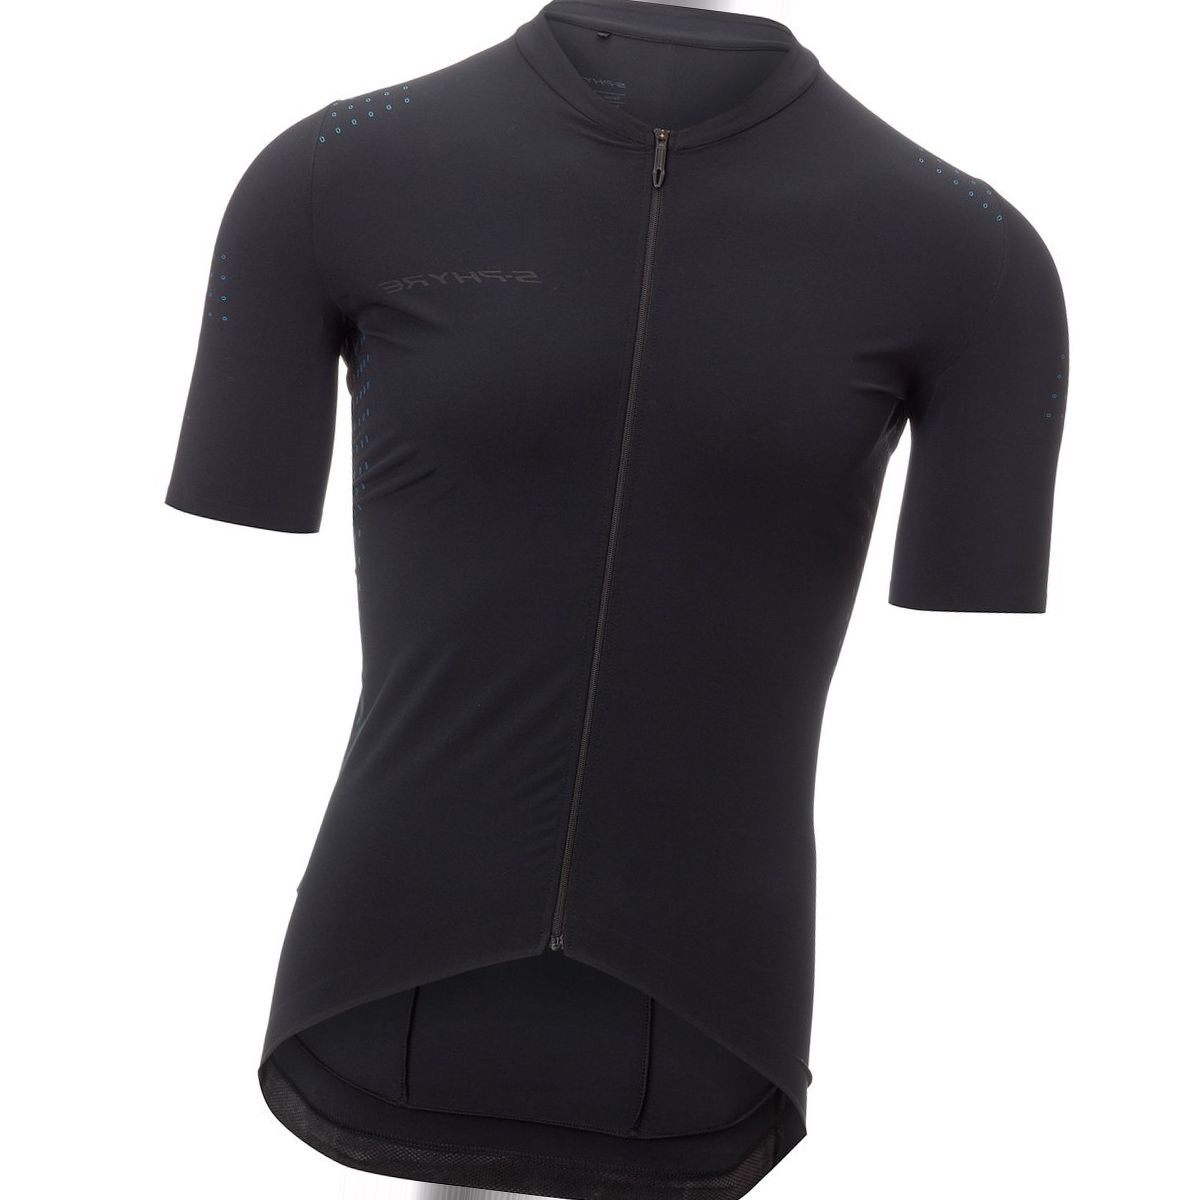 Shimano S-PHYRE Short-Sleeve Jersey - Men's